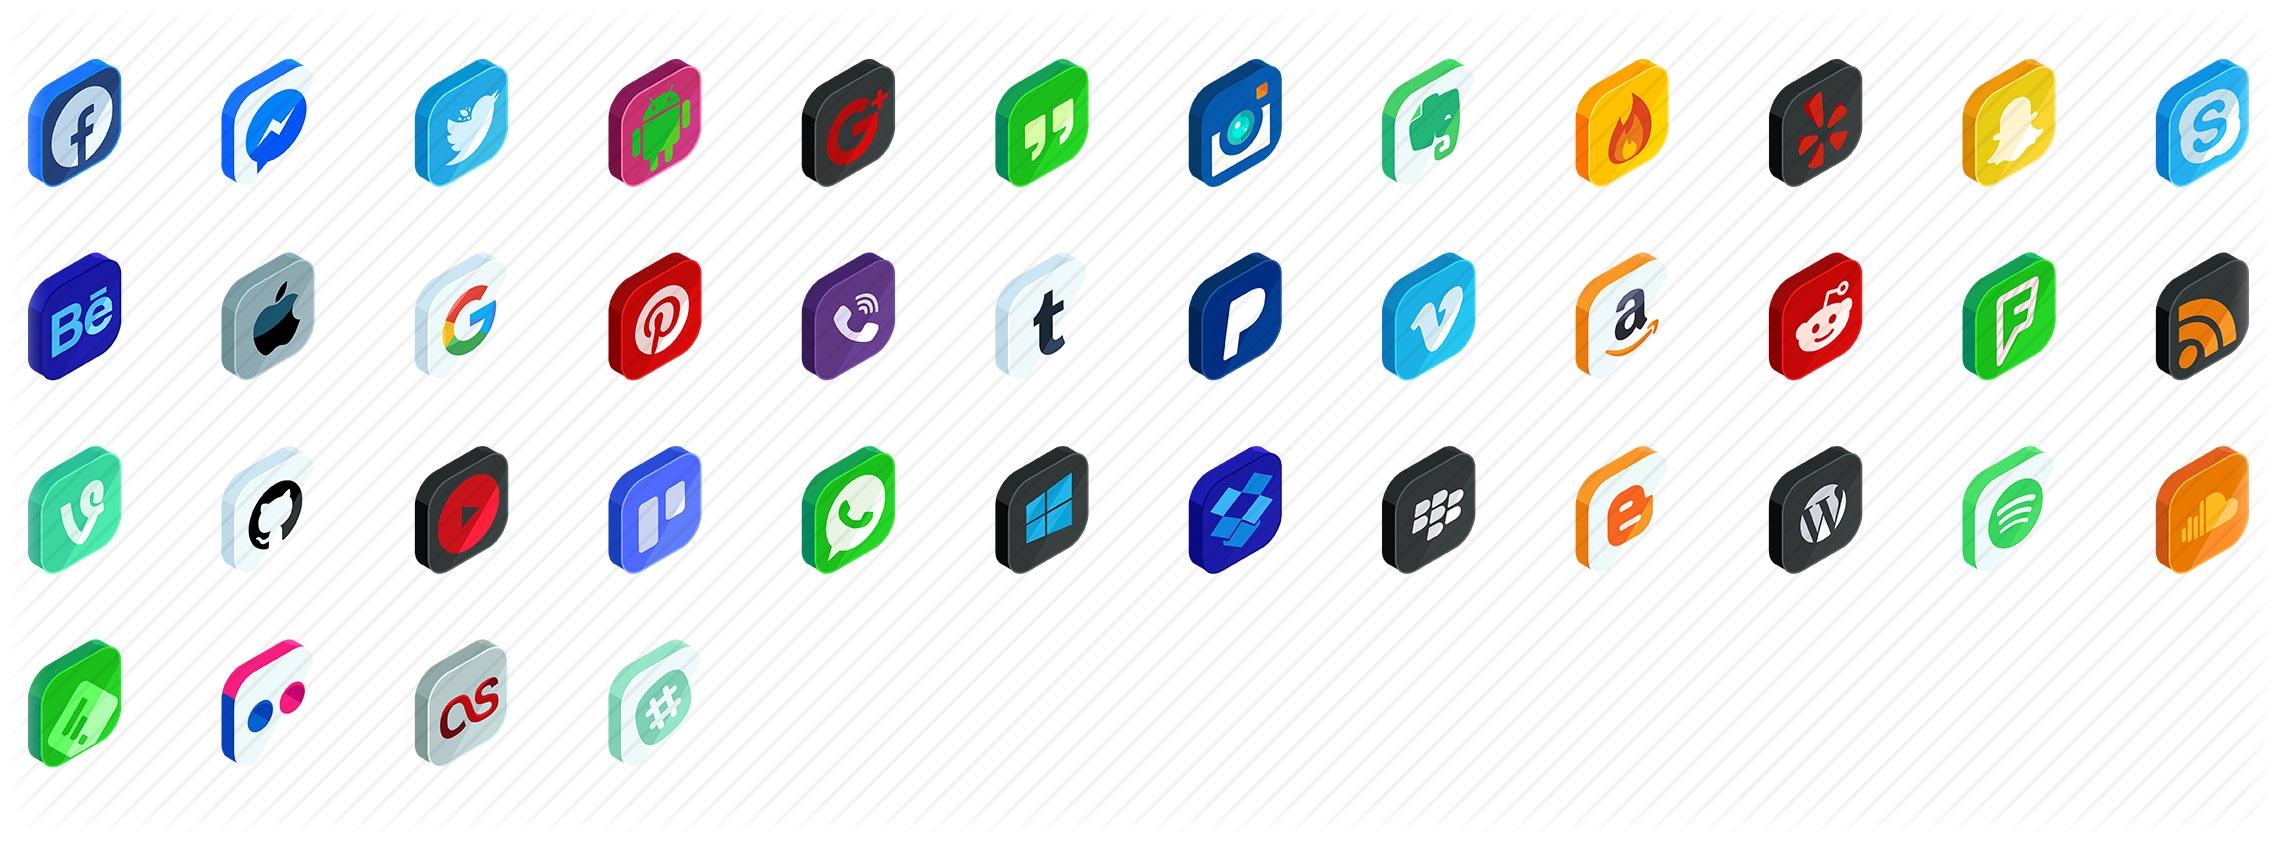 Social Media Isometric Icons